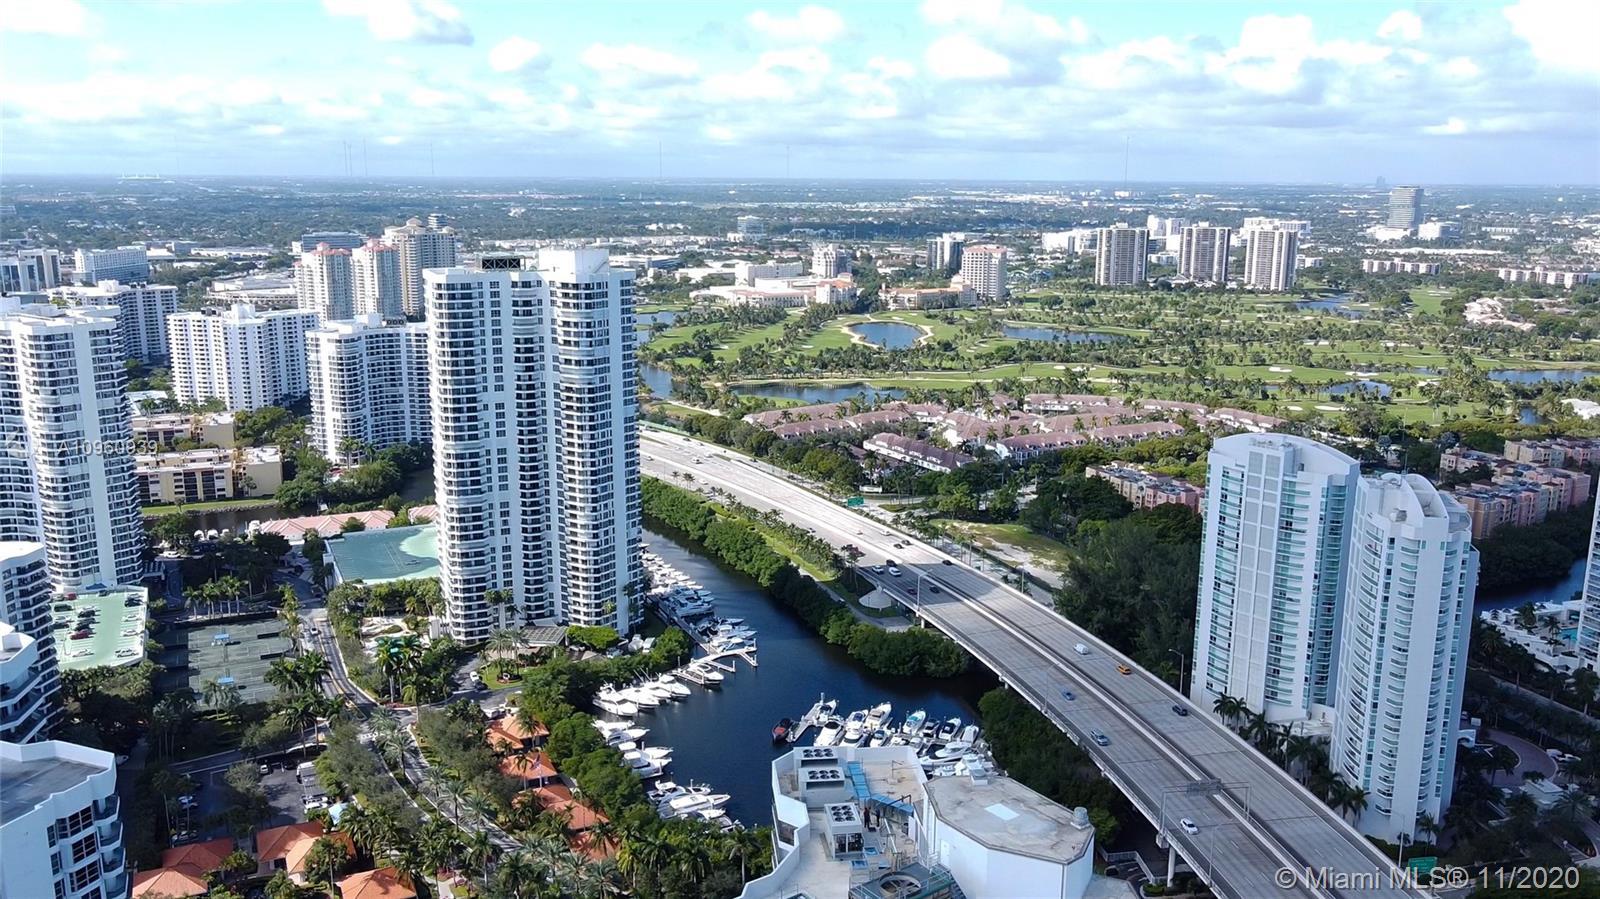 Photo of 3500 Mystic Pointe Dr #2107, Aventura, Florida, 33180 -